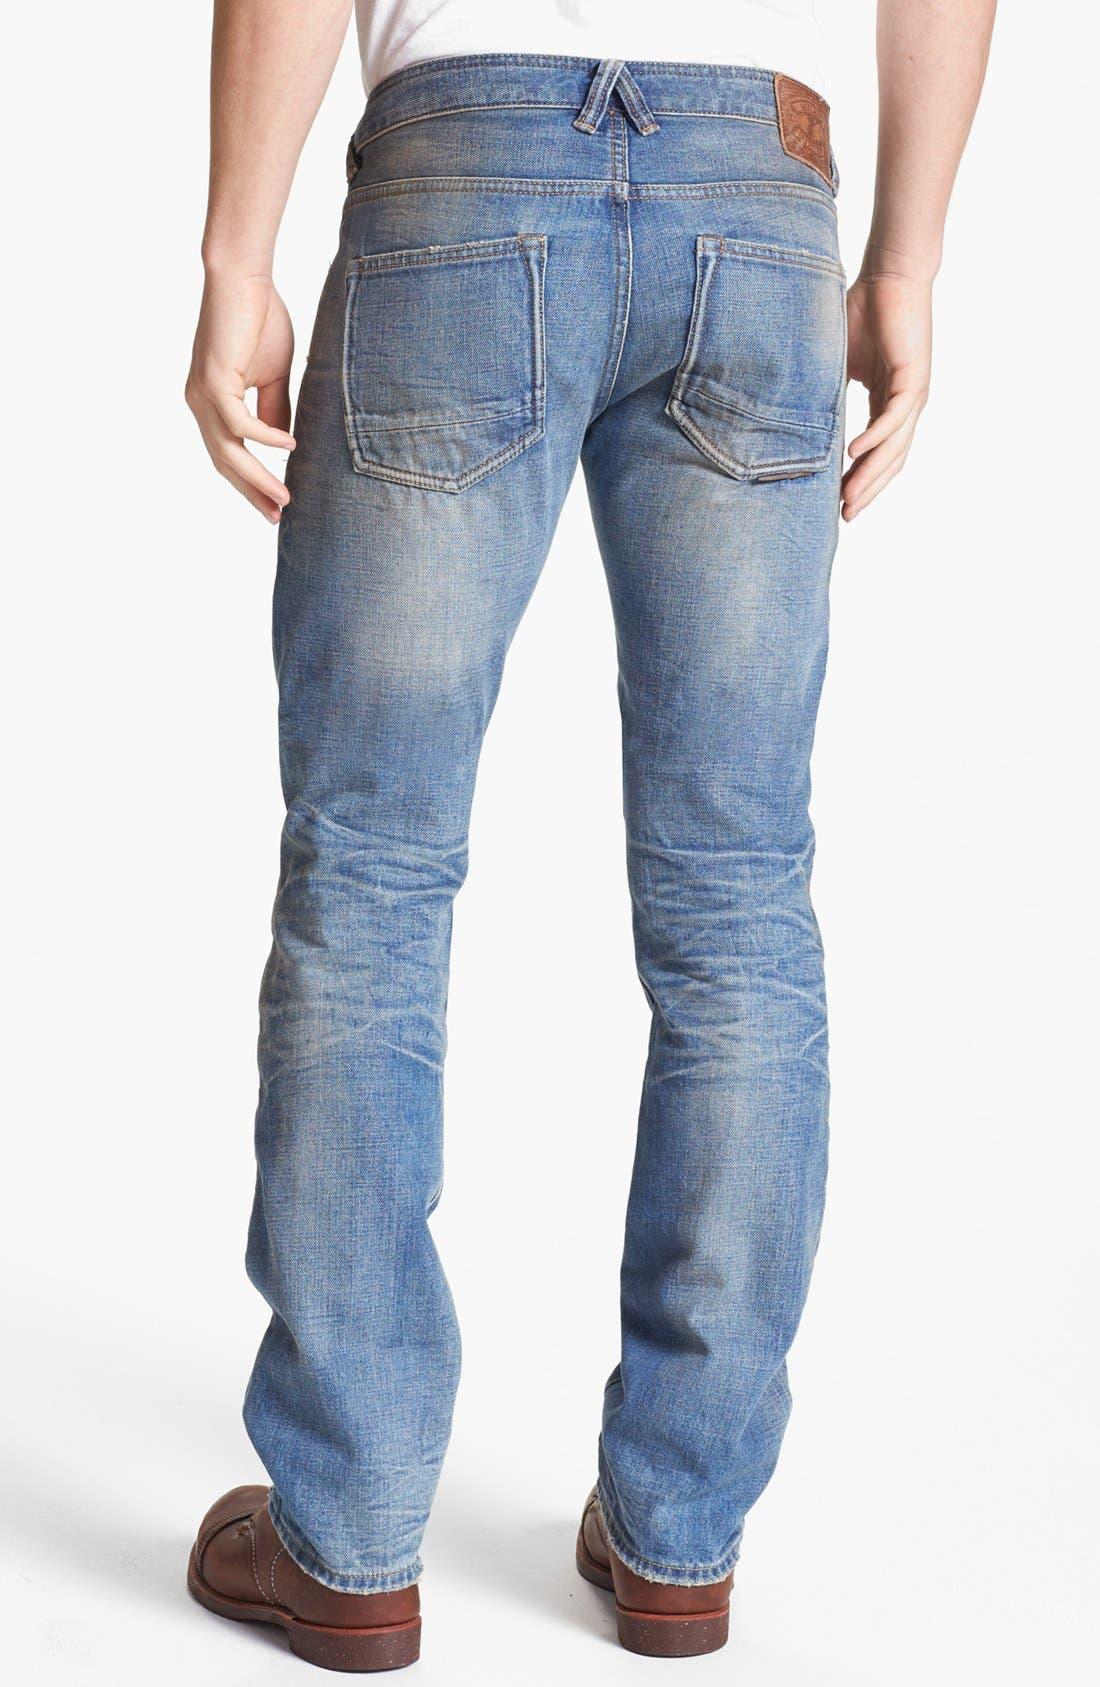 Alternate Image 1 Selected - Natural Selection Denim Straight Leg Jeans (Gamma)